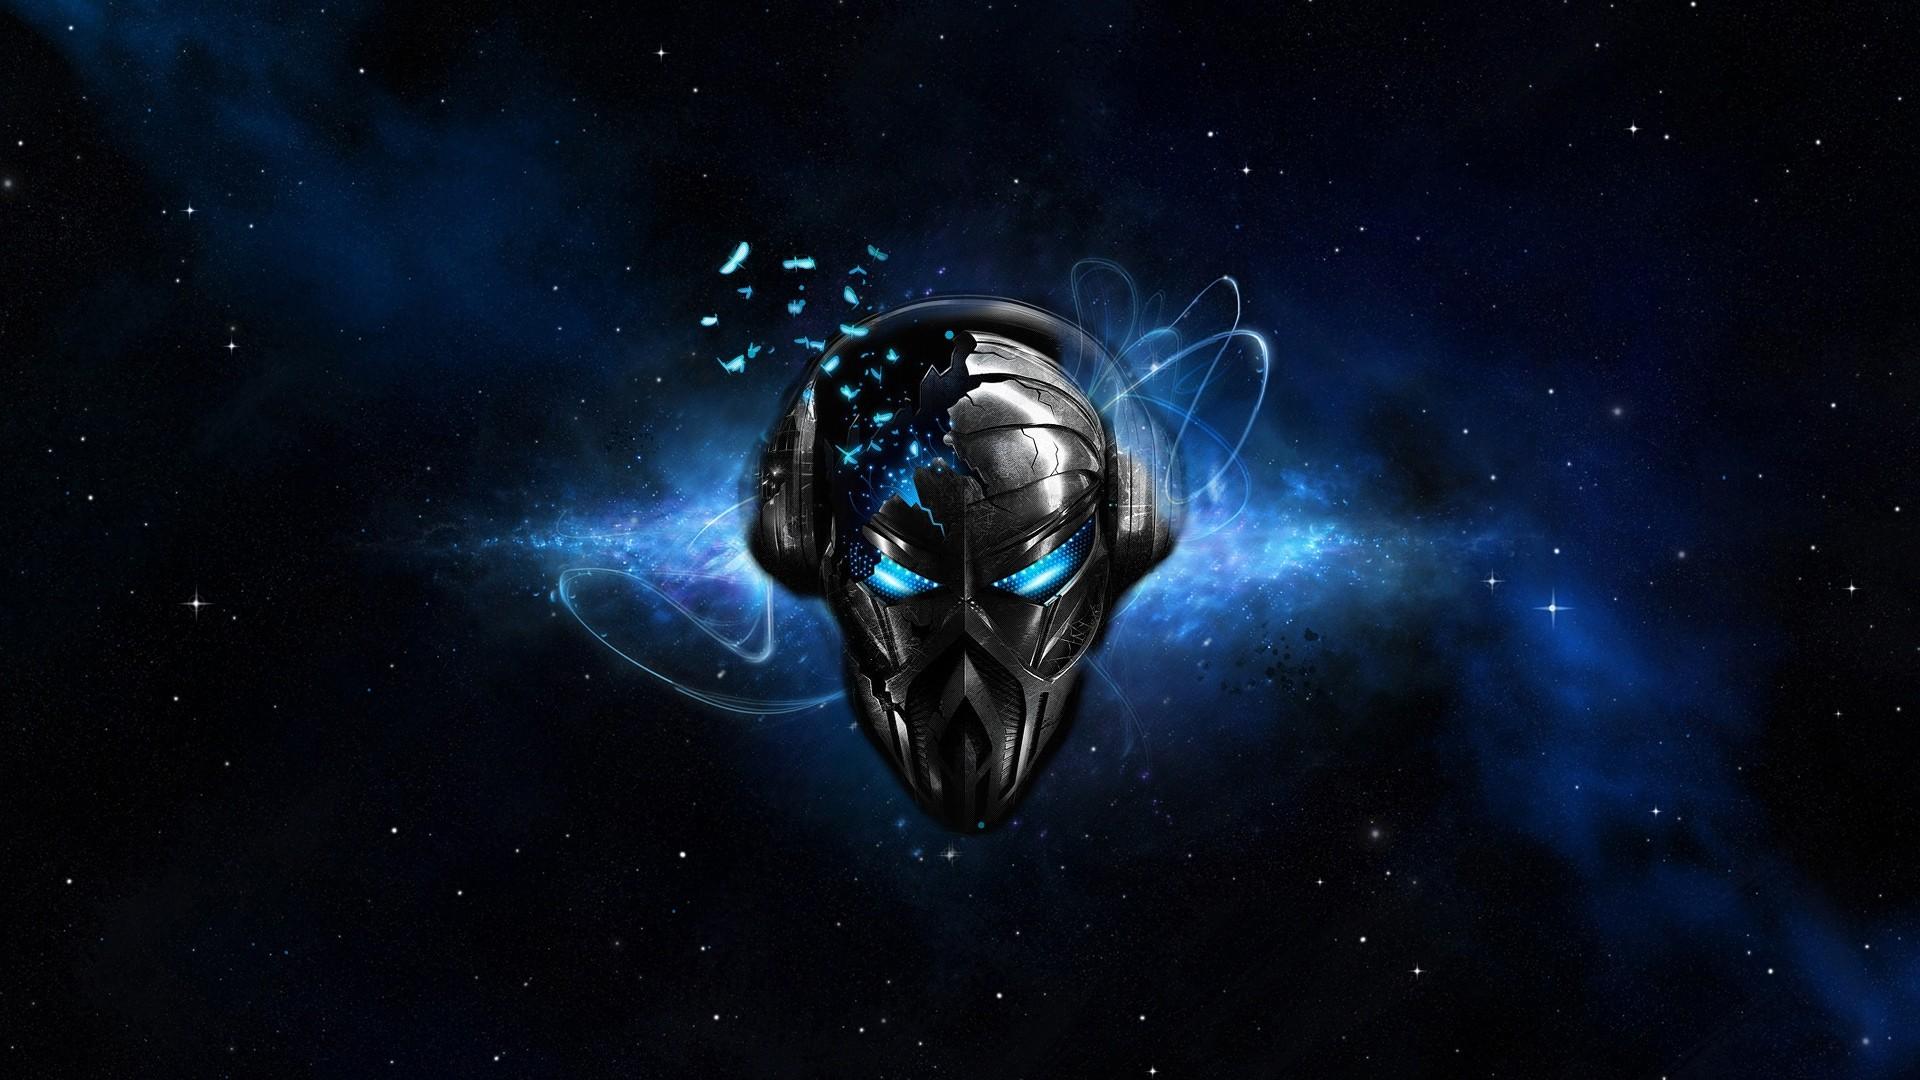 Best Wallpaper Music Space - illustration-digital-art-blue-eyes-space-artwork-stars-mask-music-nebula-headphones-skull-atmosphere-universe-shattered-screenshot-computer-wallpaper-outer-space-astronomical-object-110685  HD_2939.jpg